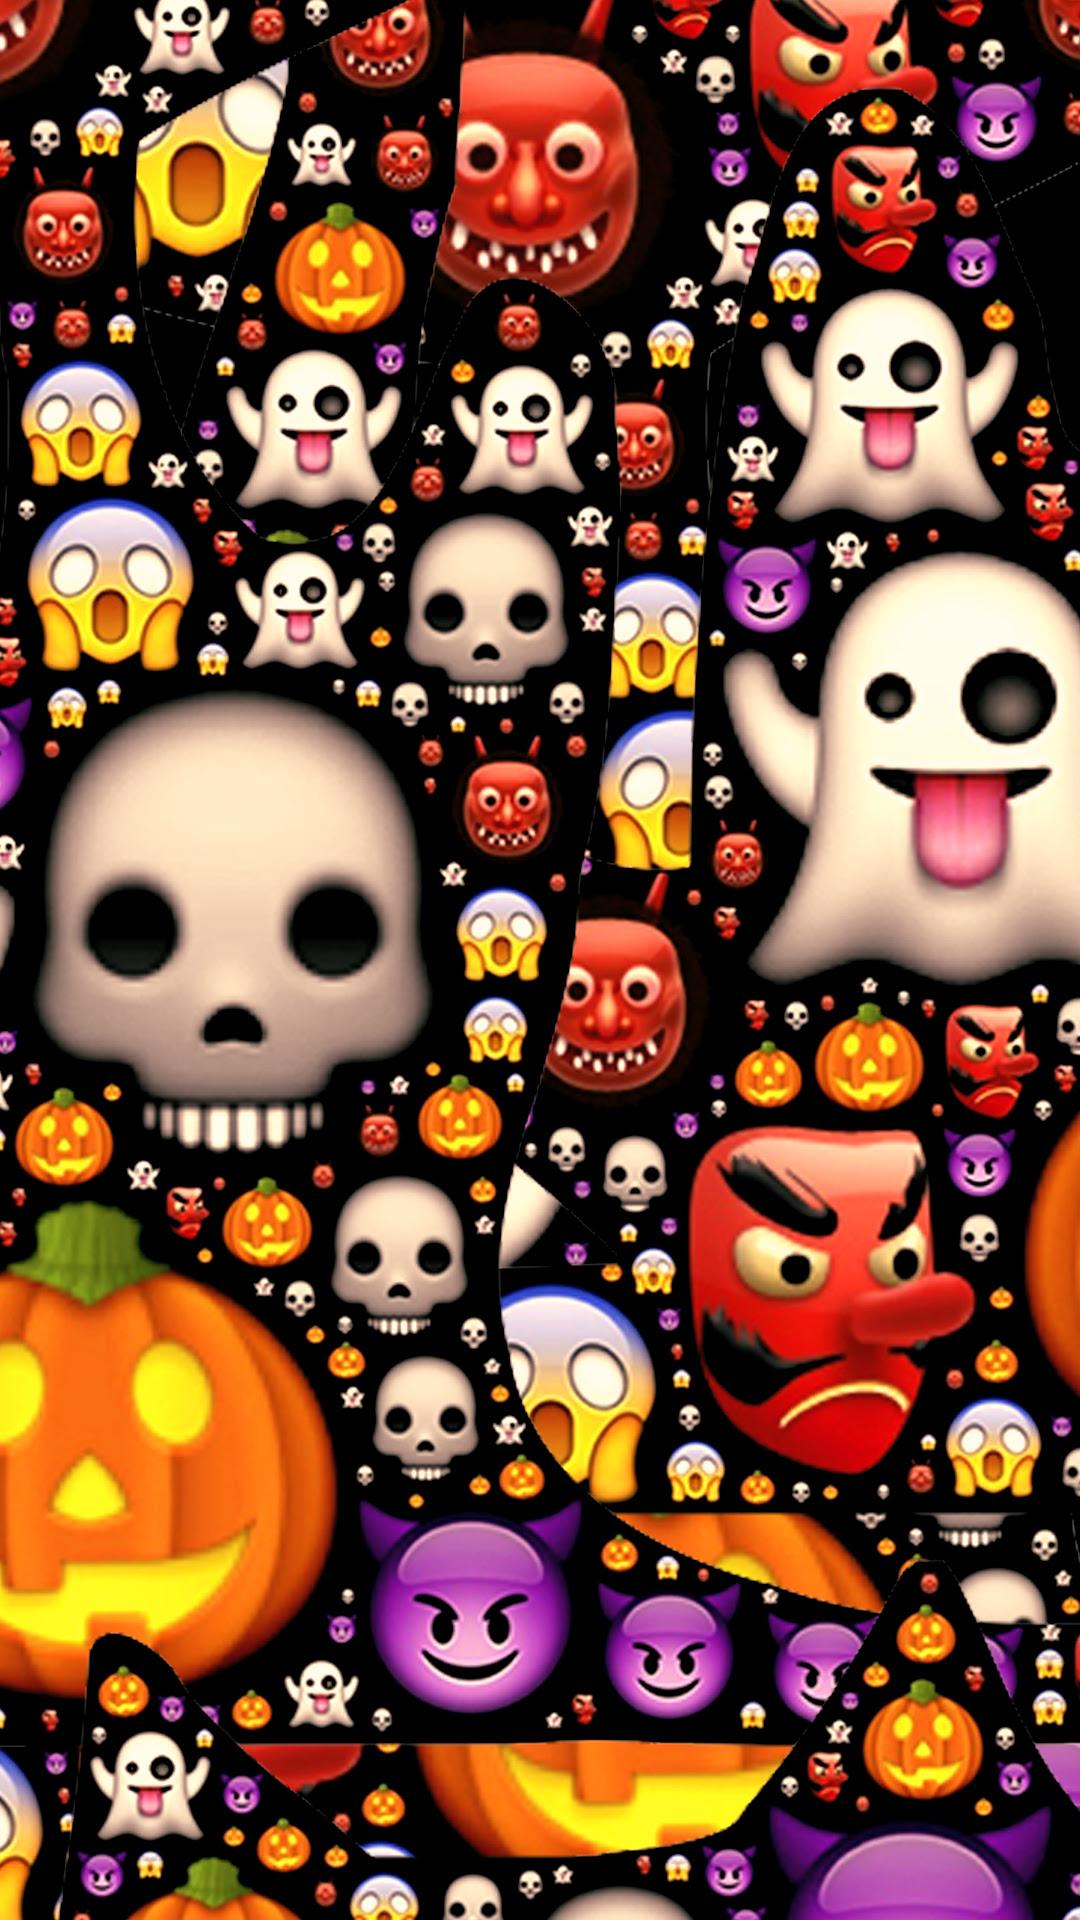 Free HD Emoji Mess Phone Wallpaper...4458